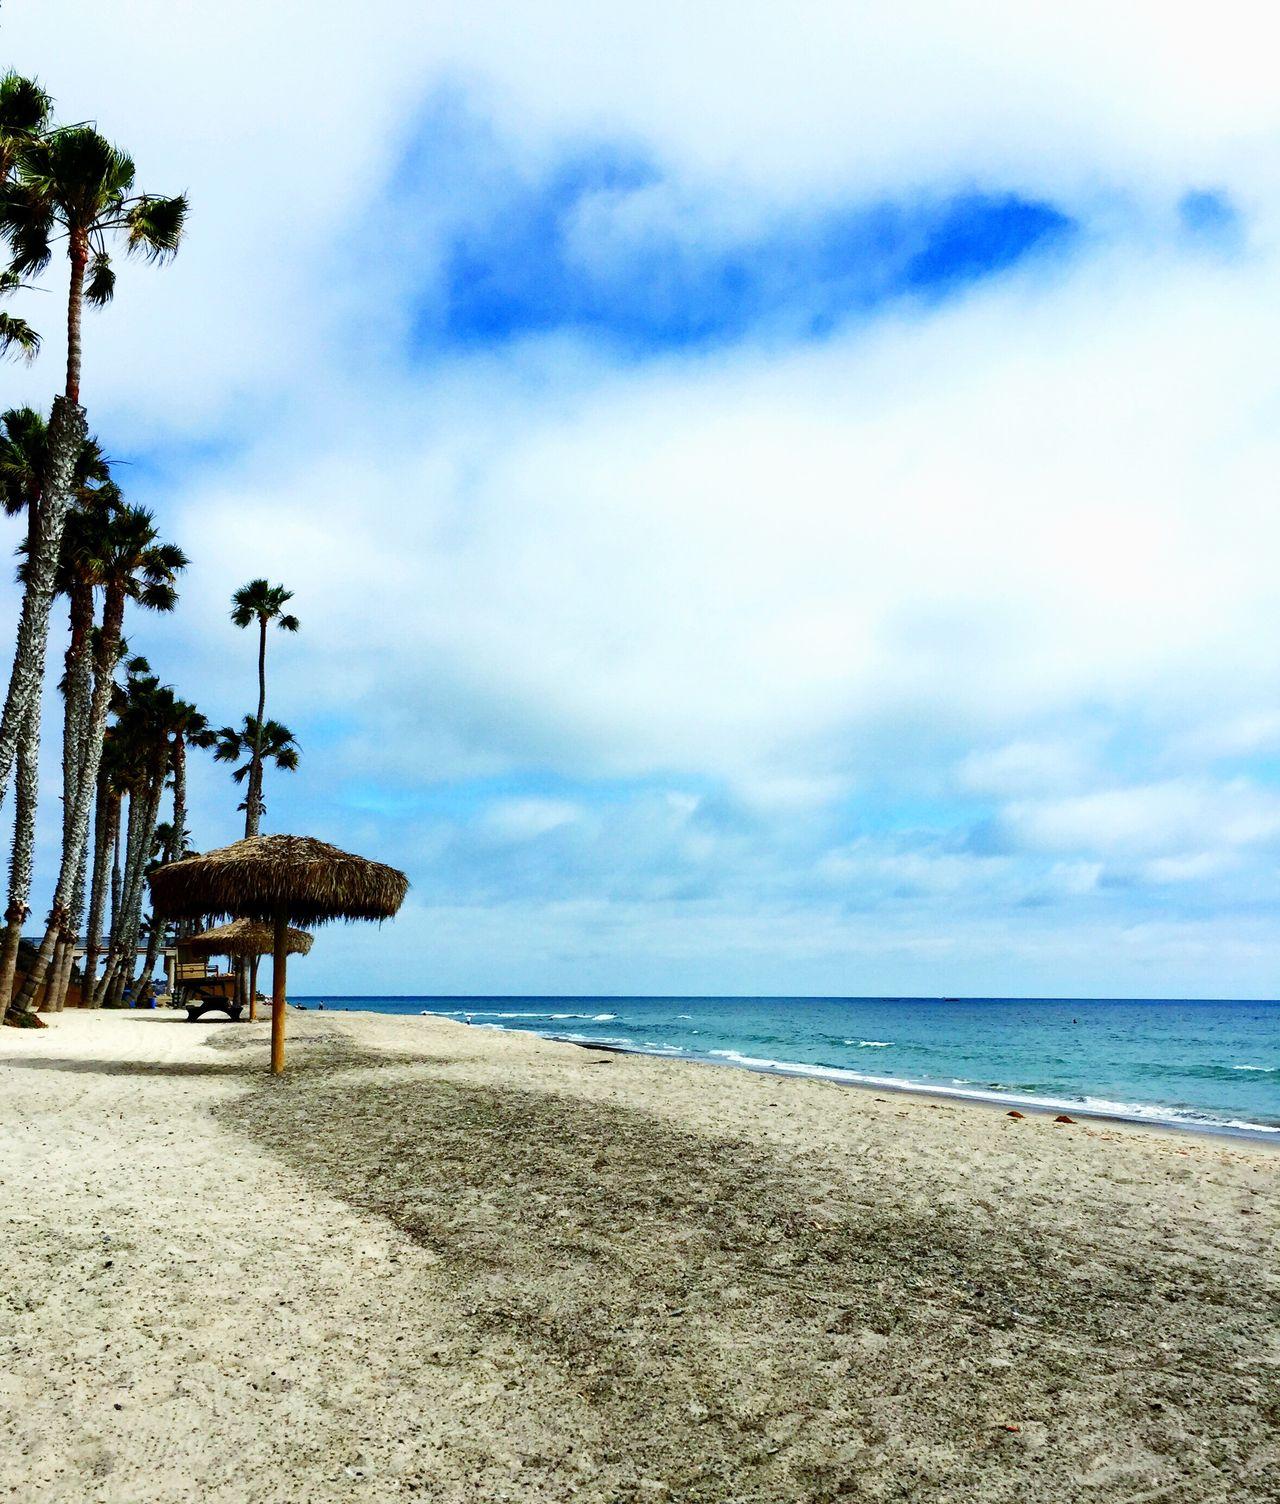 San Clemente beach🌴 Beach Beachphotography Beach Photography Beach Life Beach Day Beach Time Beach Walk Shoreline Sky And Clouds Sea And Sky Seascape Seaside Tranquility The Essence Of Summer Feel The Journey California California Love California Coast California Dreaming Showcase June